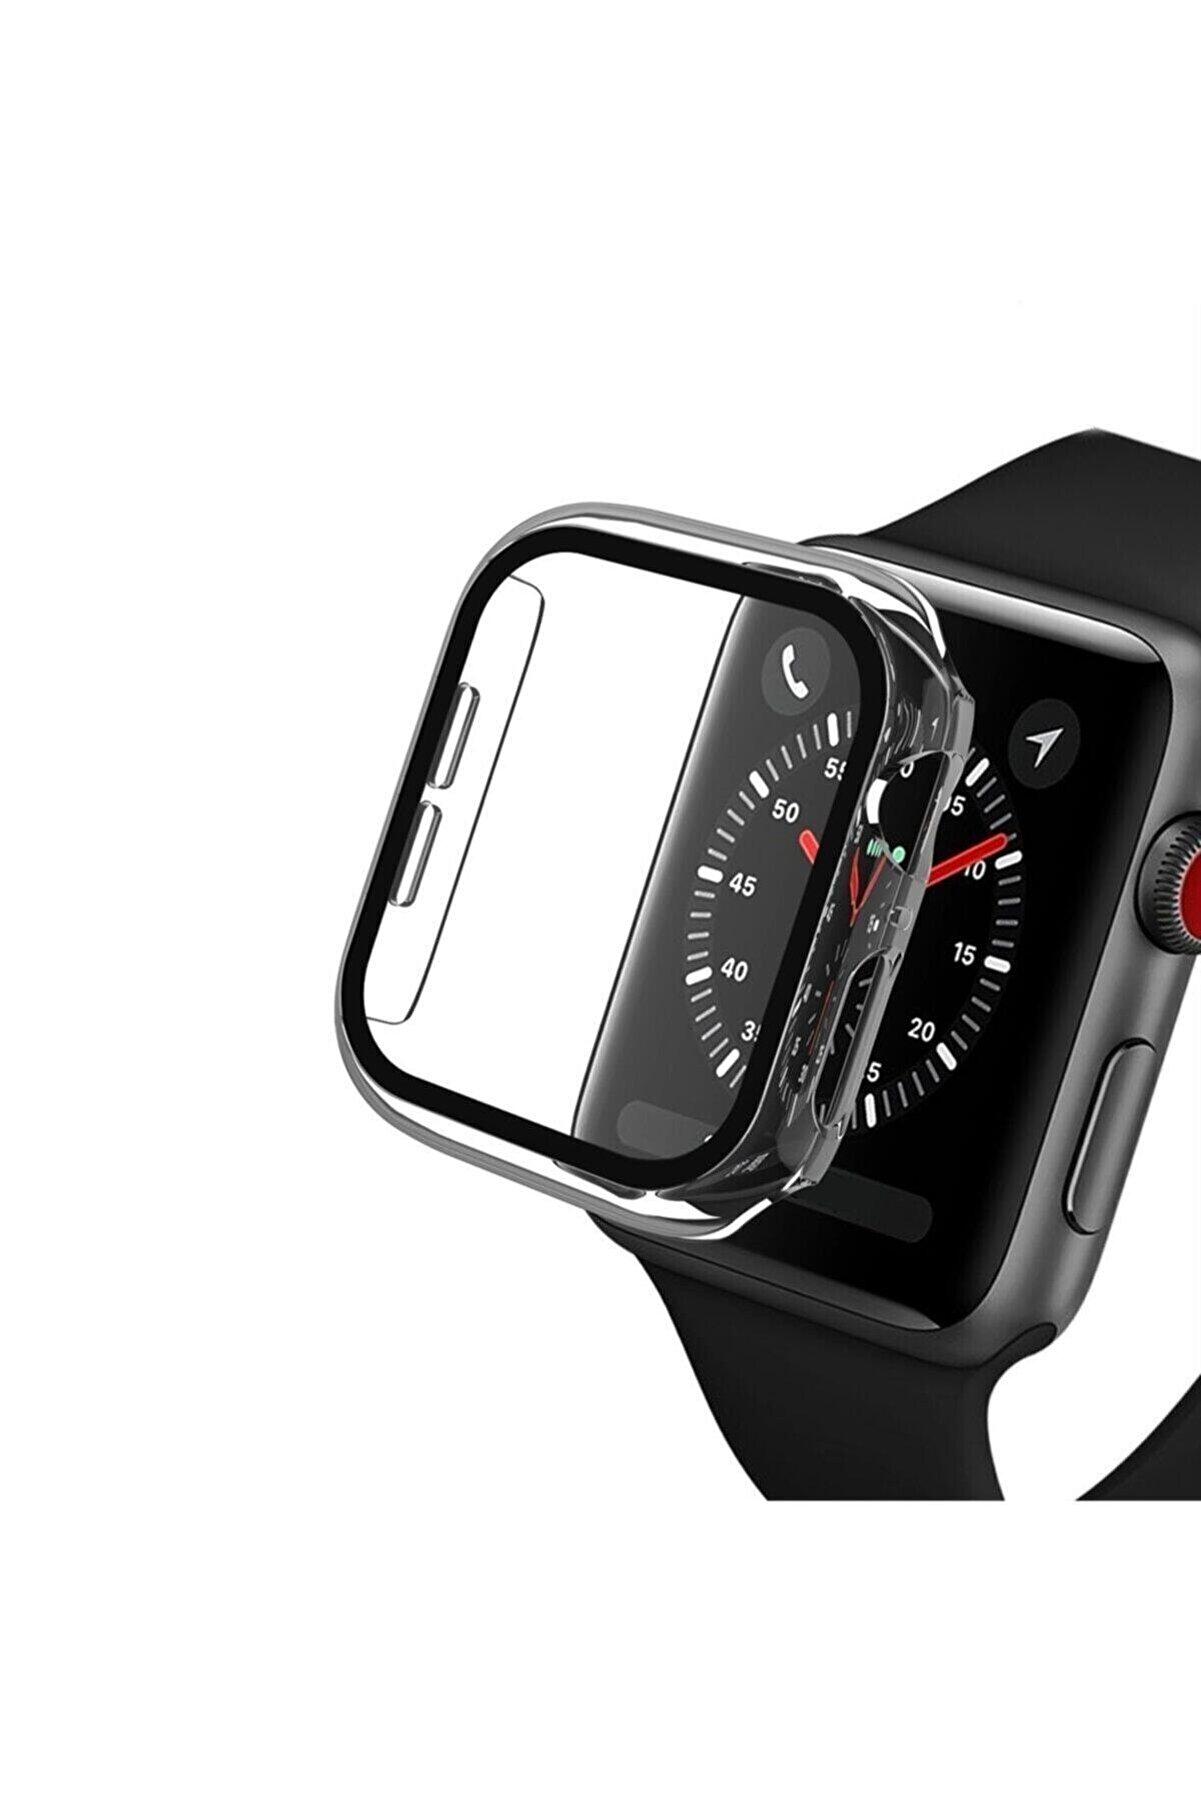 carecase Apple Watch Series Şeffaf Renk Sert Silikon Kılıf 44 Mm Tam Koruma